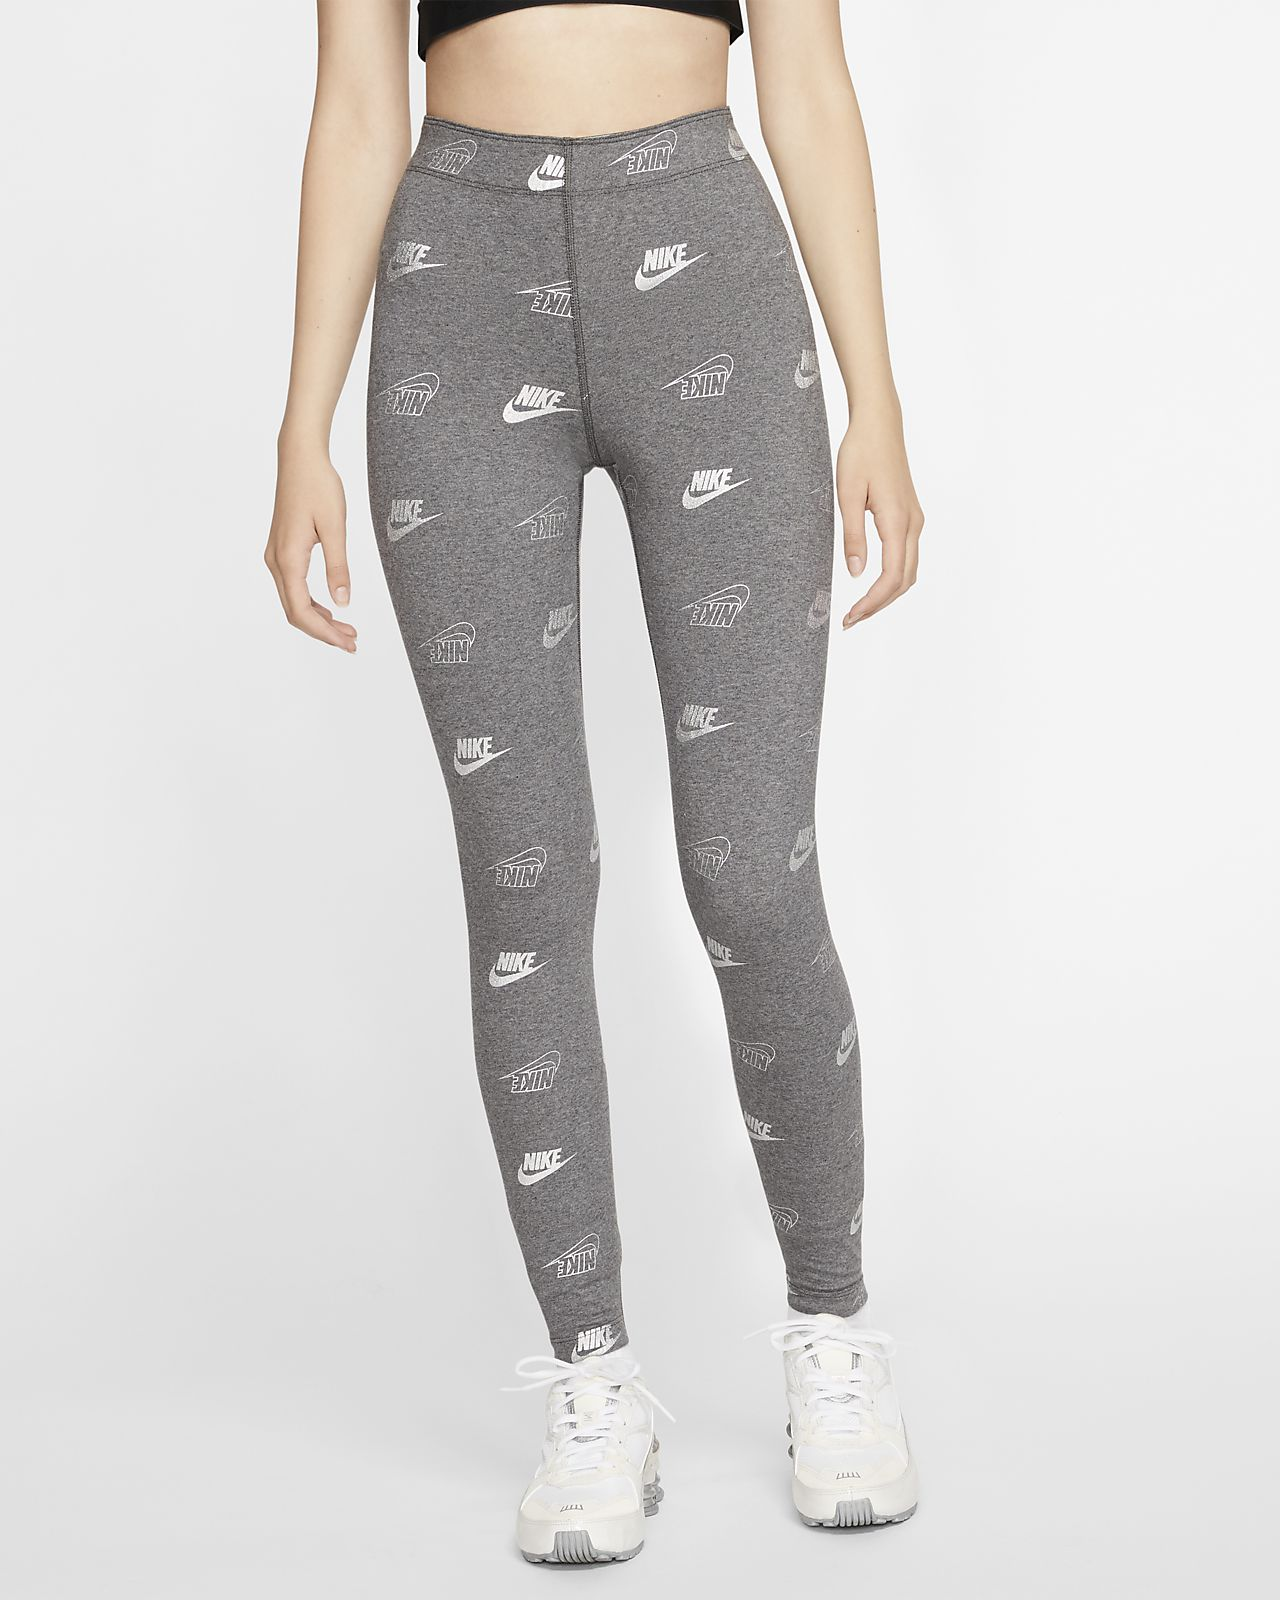 Nike Sportswear Damen Leggings mit Print